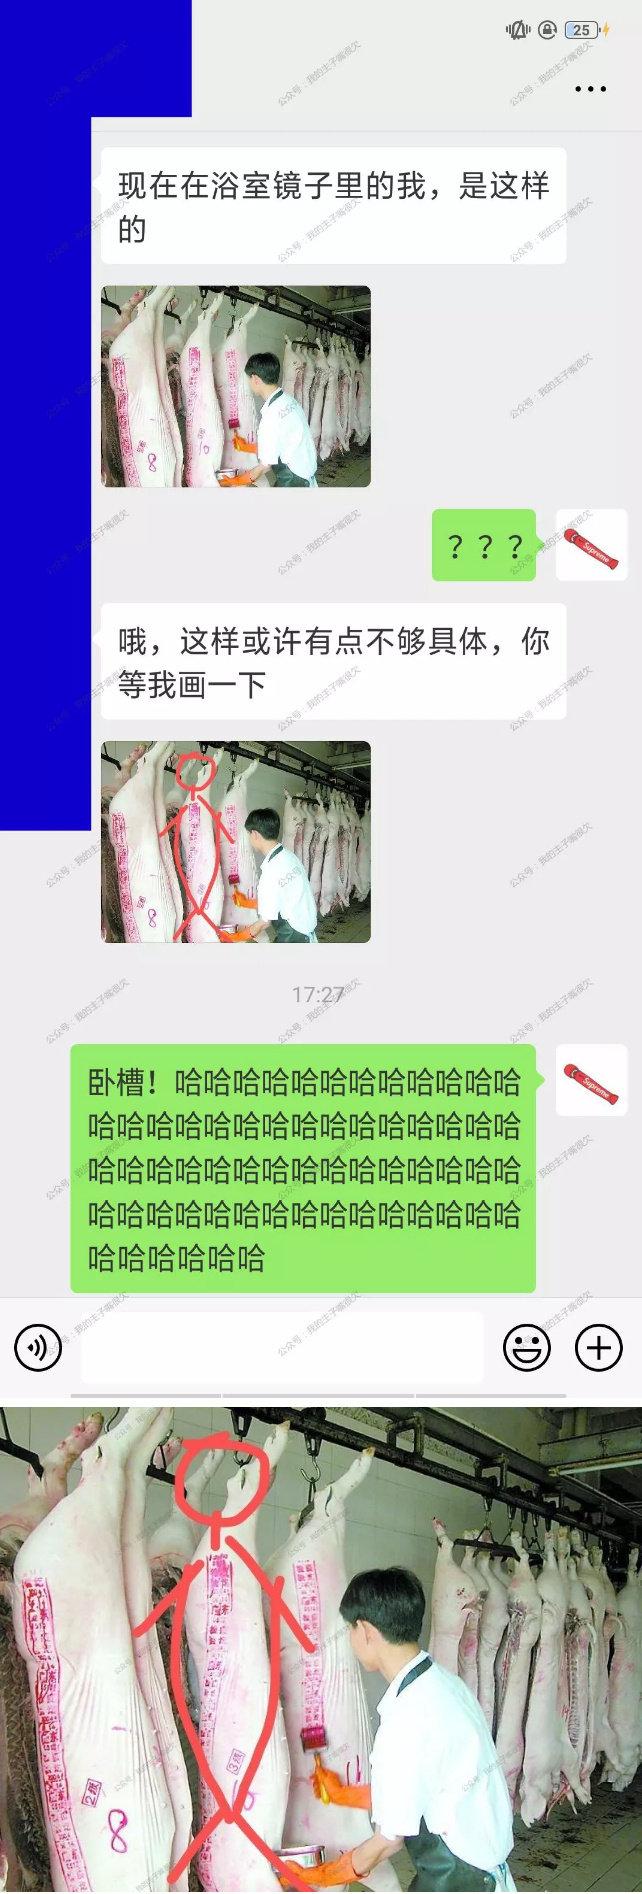 www.taoshu6.com_当魔鬼白富美遇上渣男飞行员会发生什么?你开飞机也跑不掉 taoshu6.net淘书楼淘福利 第9张